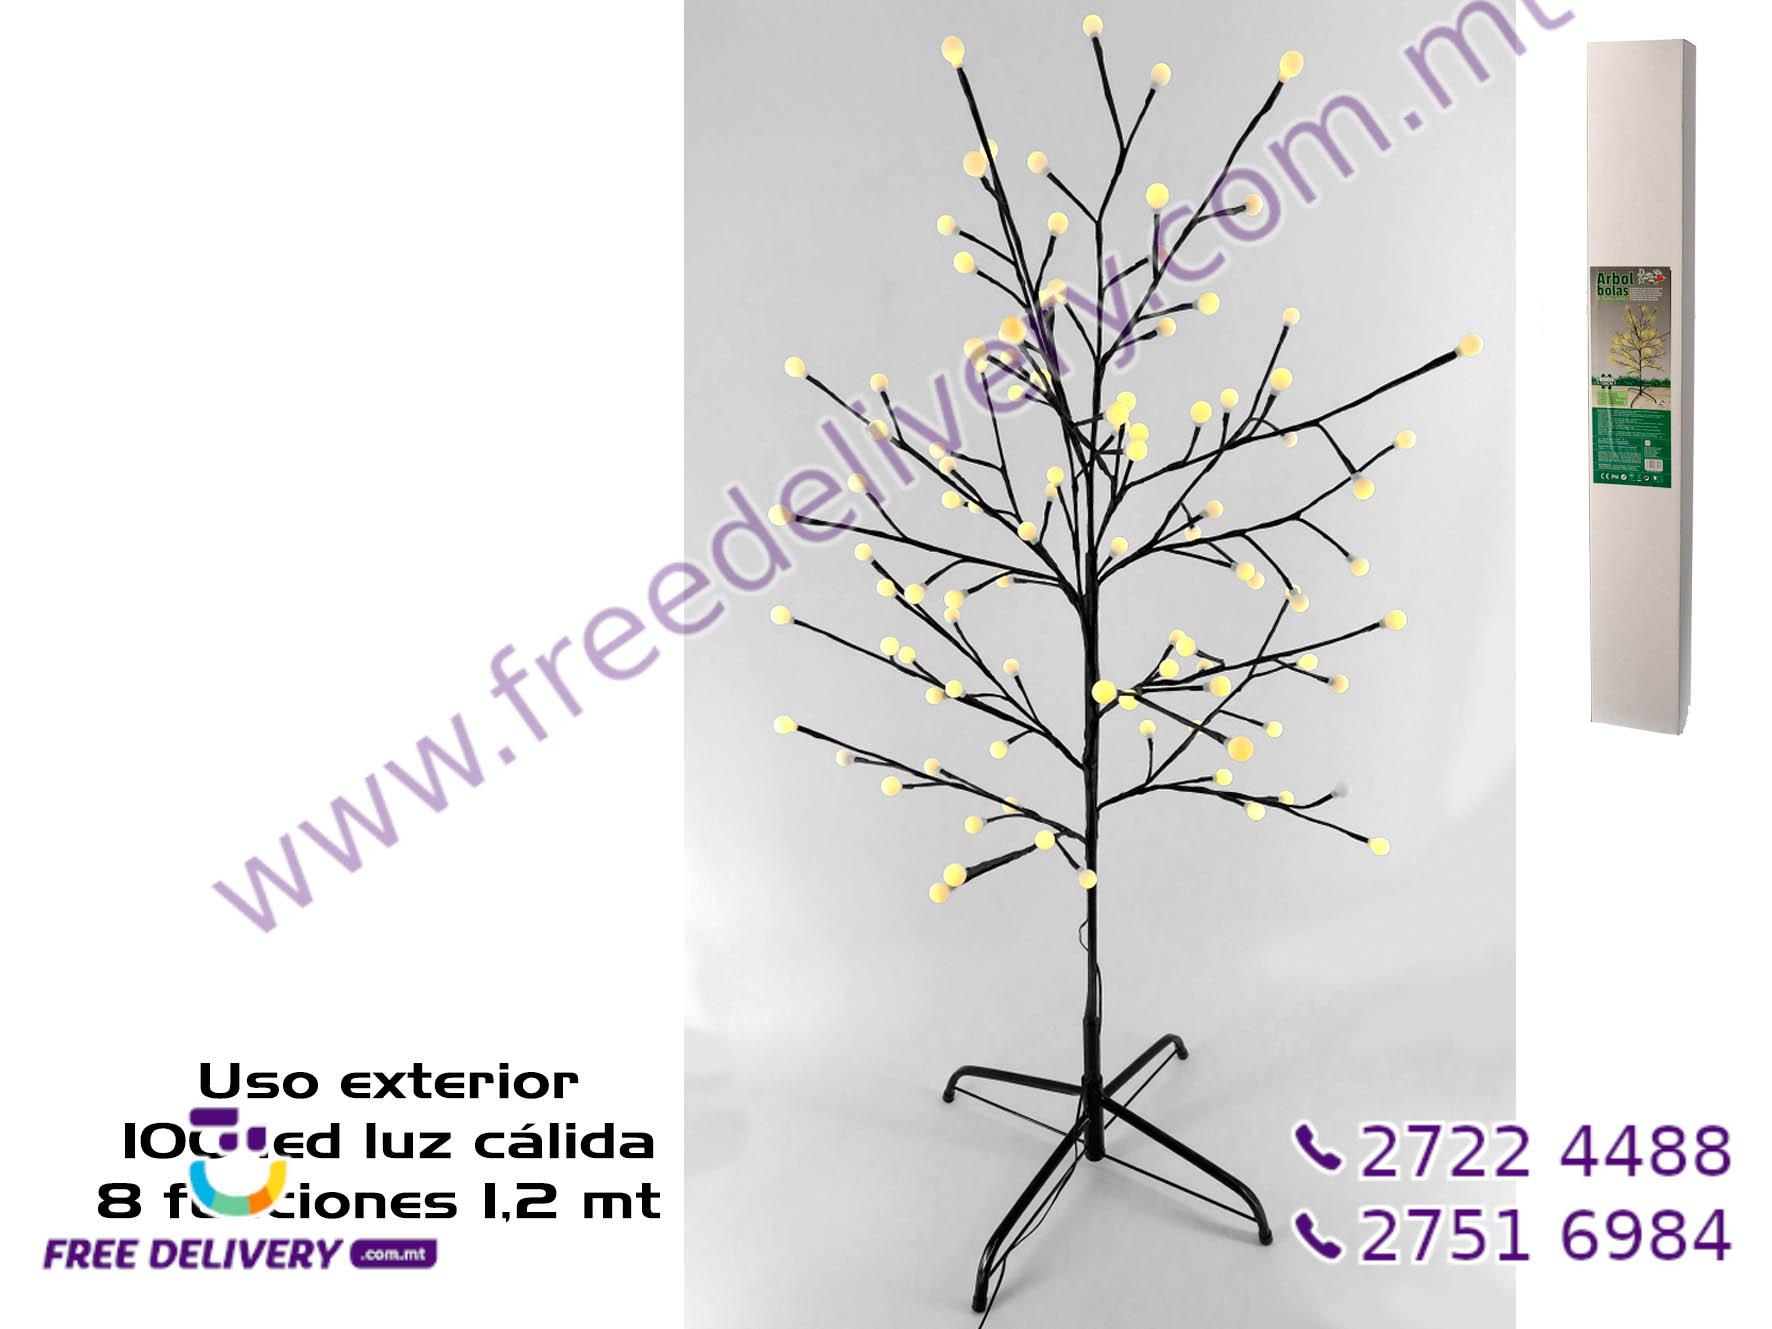 100 WARM LED TREE GE885713